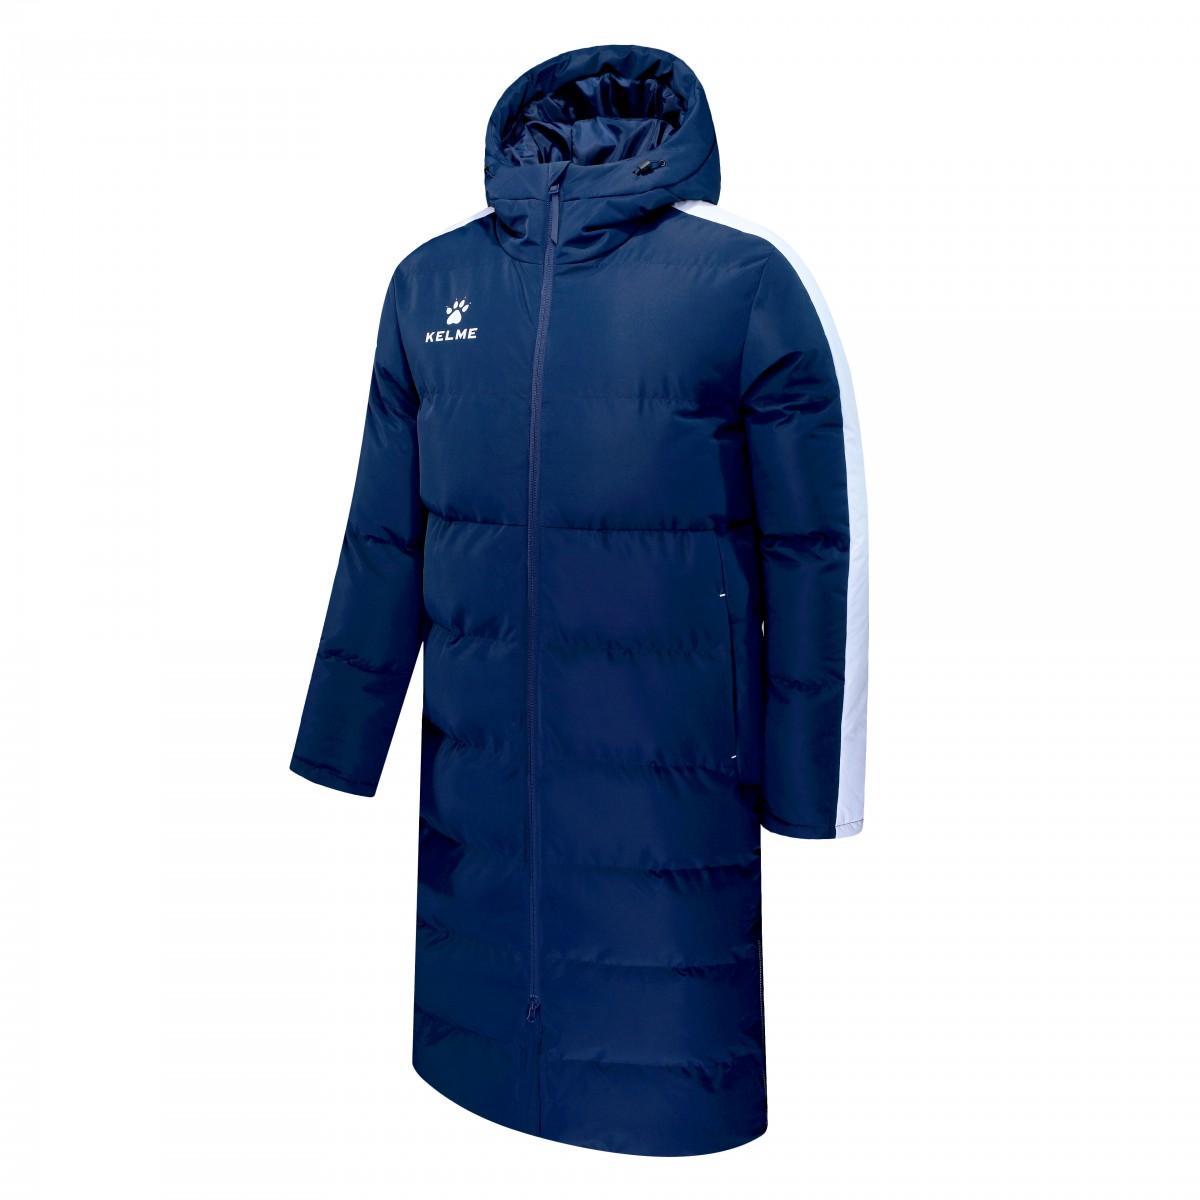 Куртка Kelme Padding Jacket(Adults) тёмно-синяя, размер XXL, артикул 3881406-424